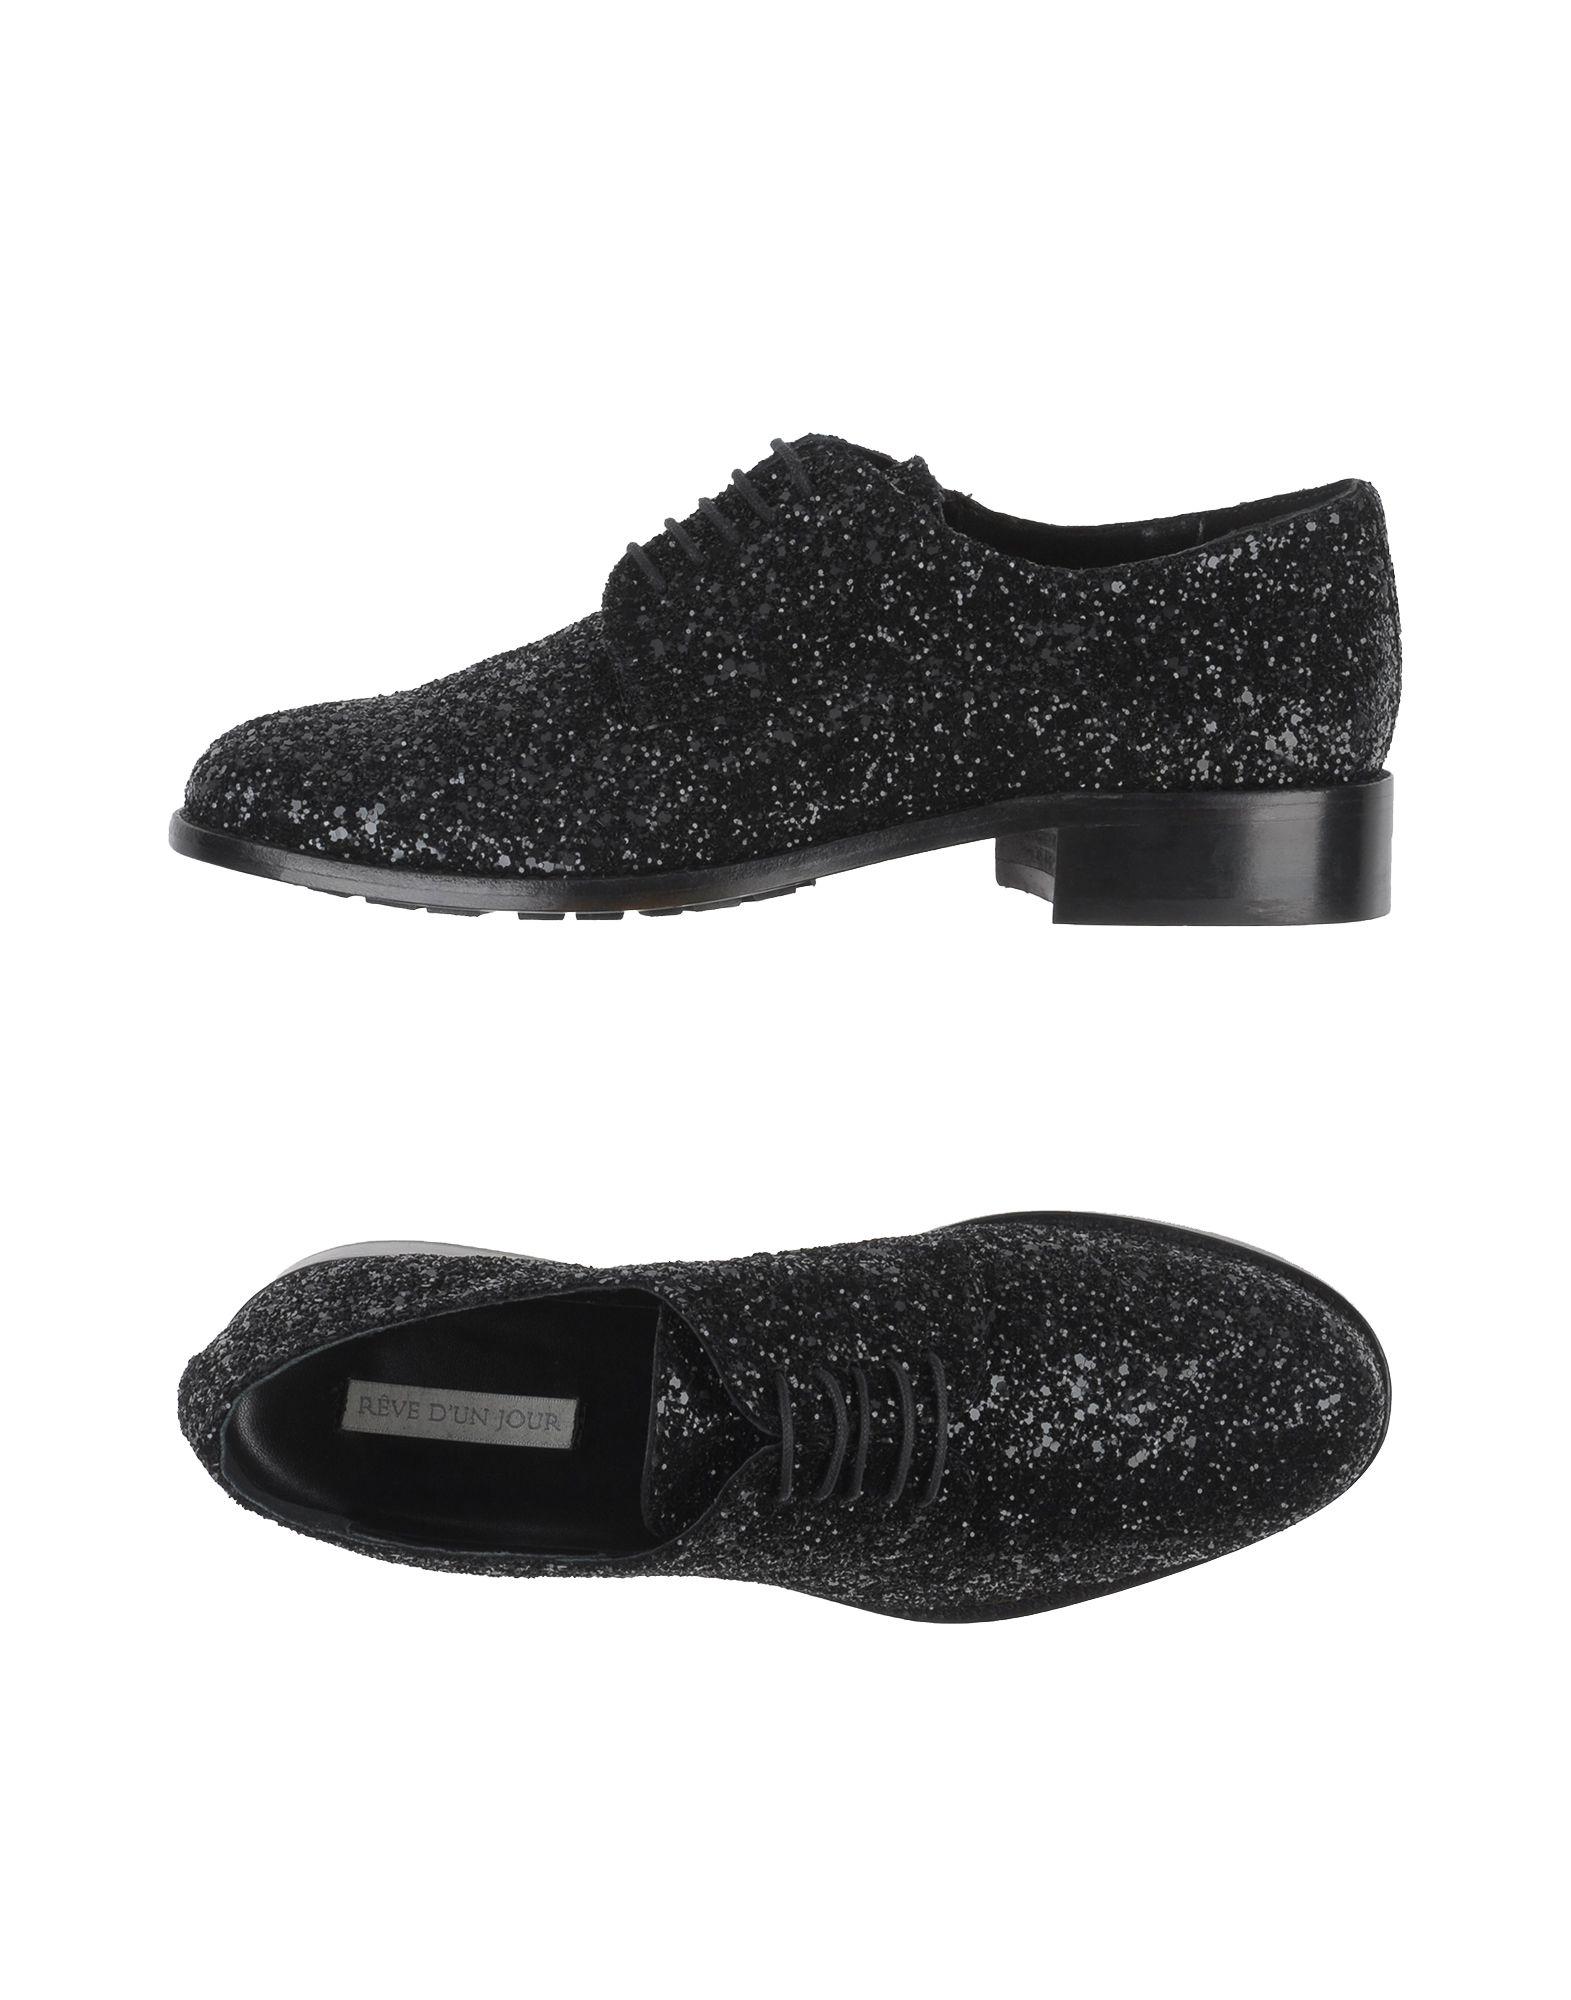 RÊVE D'UN JOUR Обувь на шнурках цены онлайн